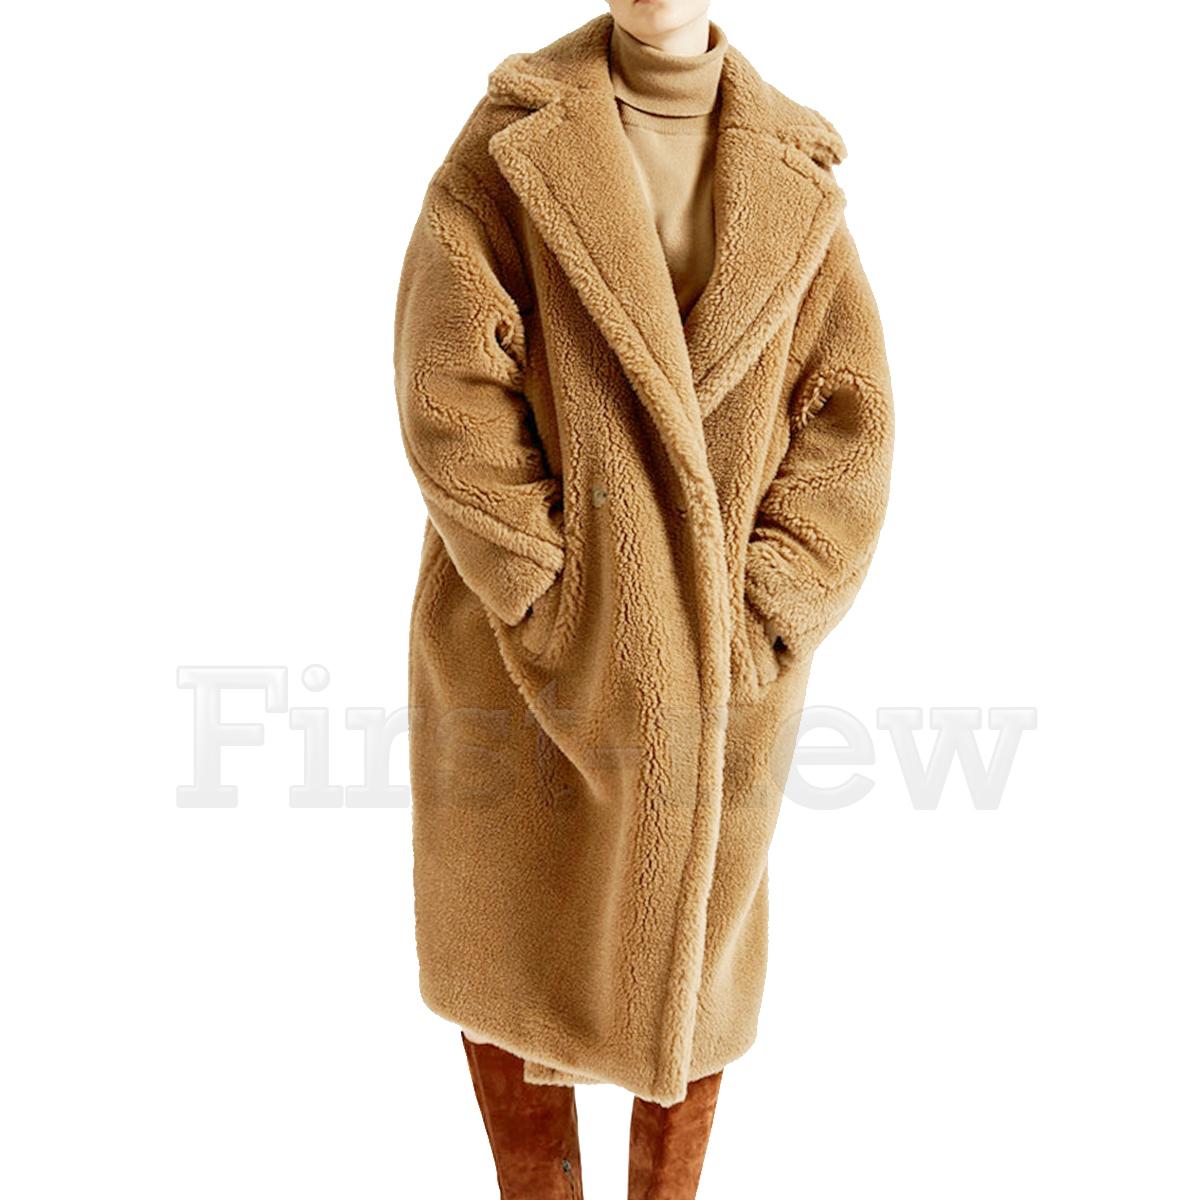 17bd61bf5 Details about Womens Bear Feel Fluffy Oversized Faux Fur Maxi Long Coat  Luxury Winter Jackets